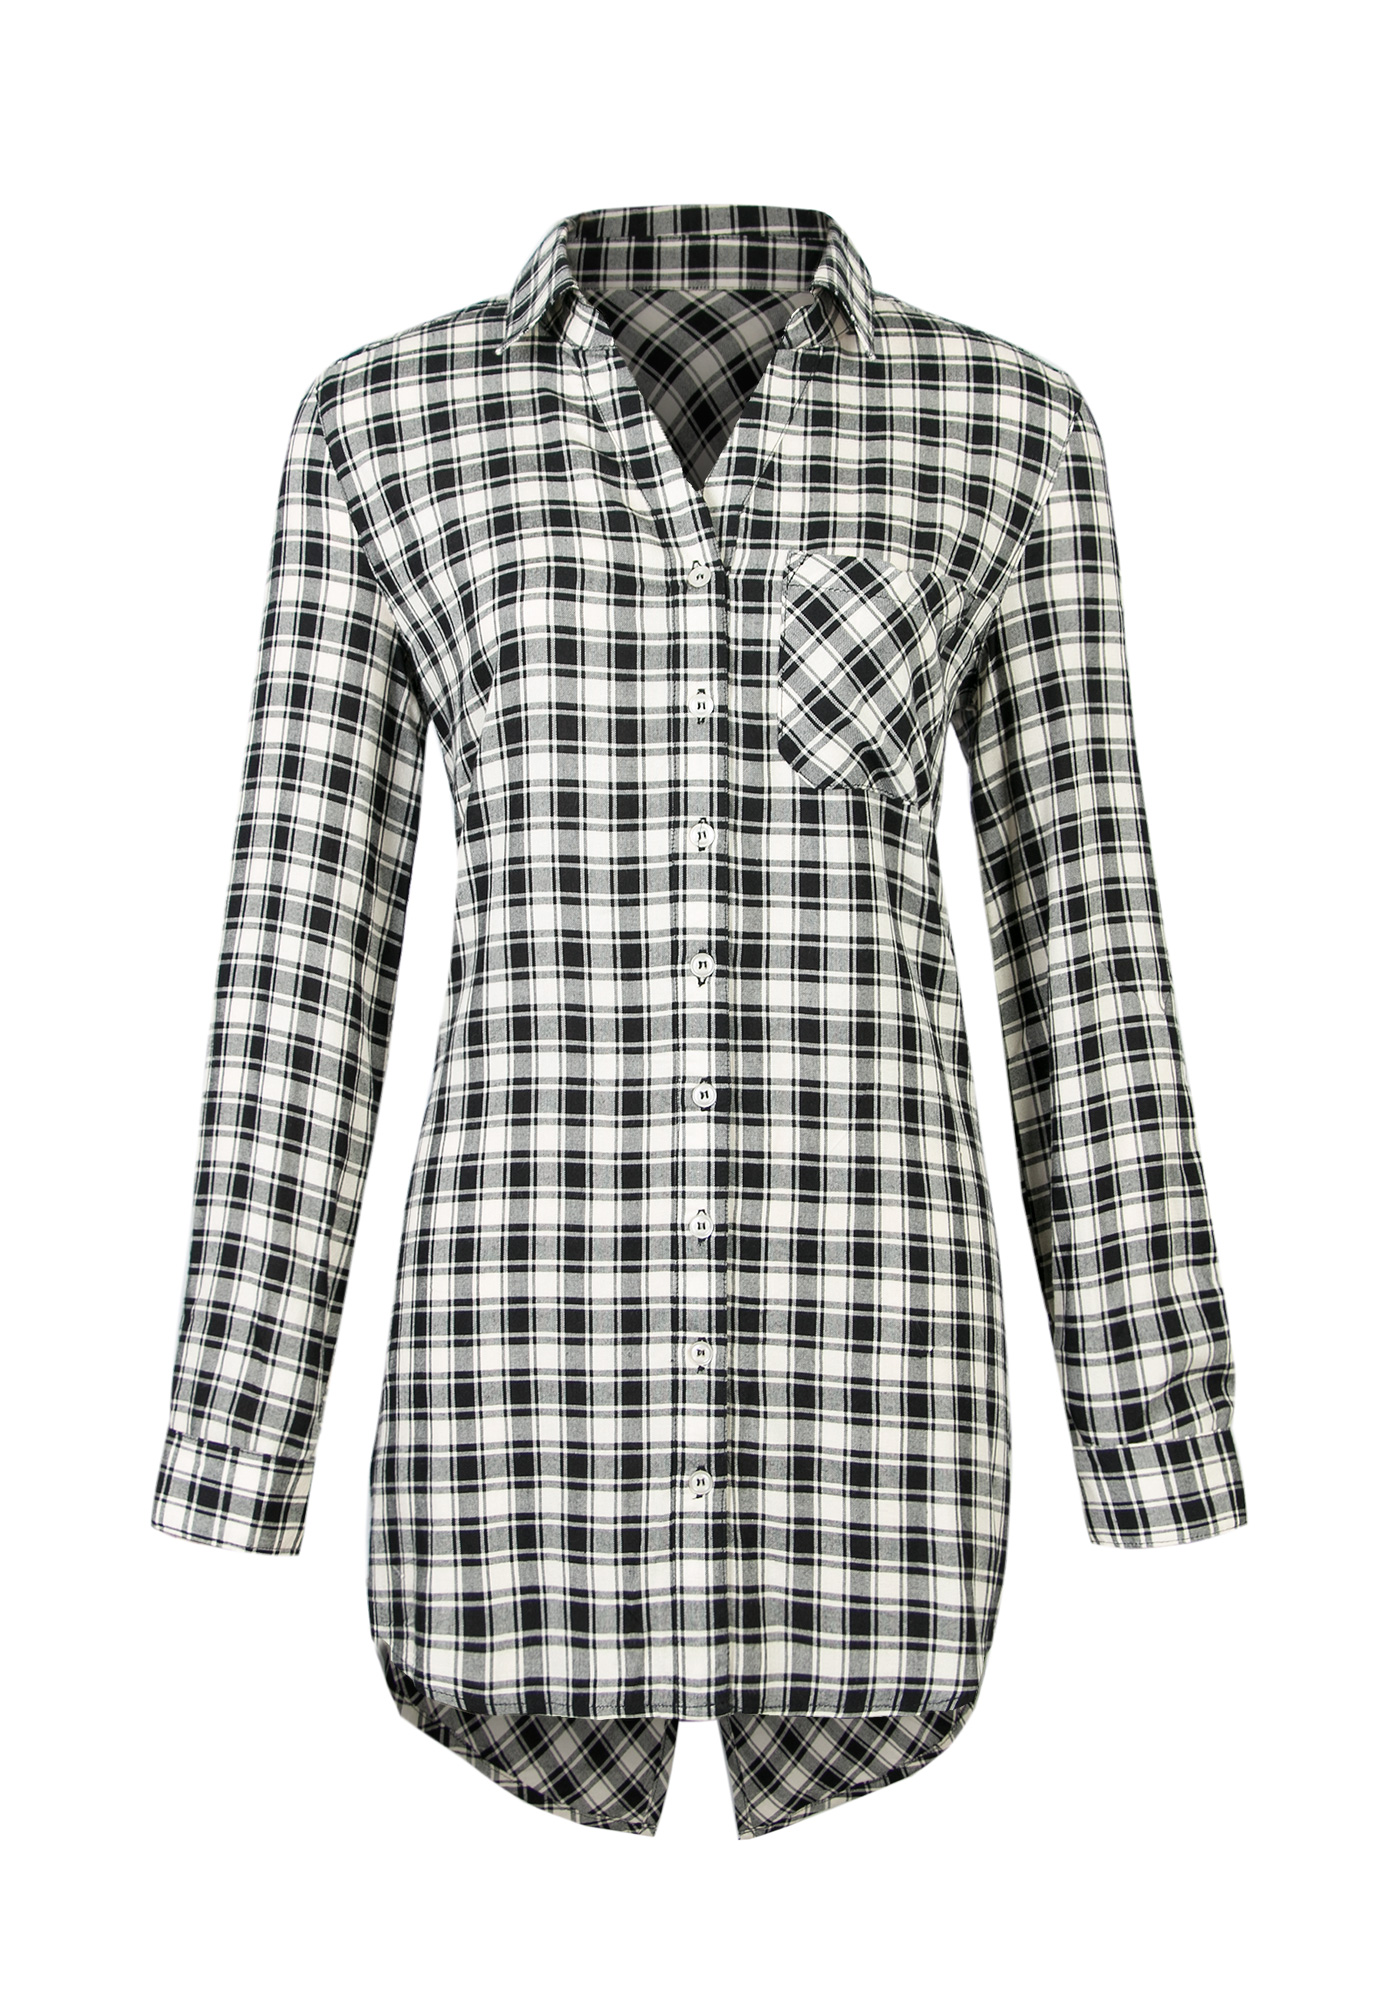 60fa72d4d4219 Ladies Black And White Plaid Shirt